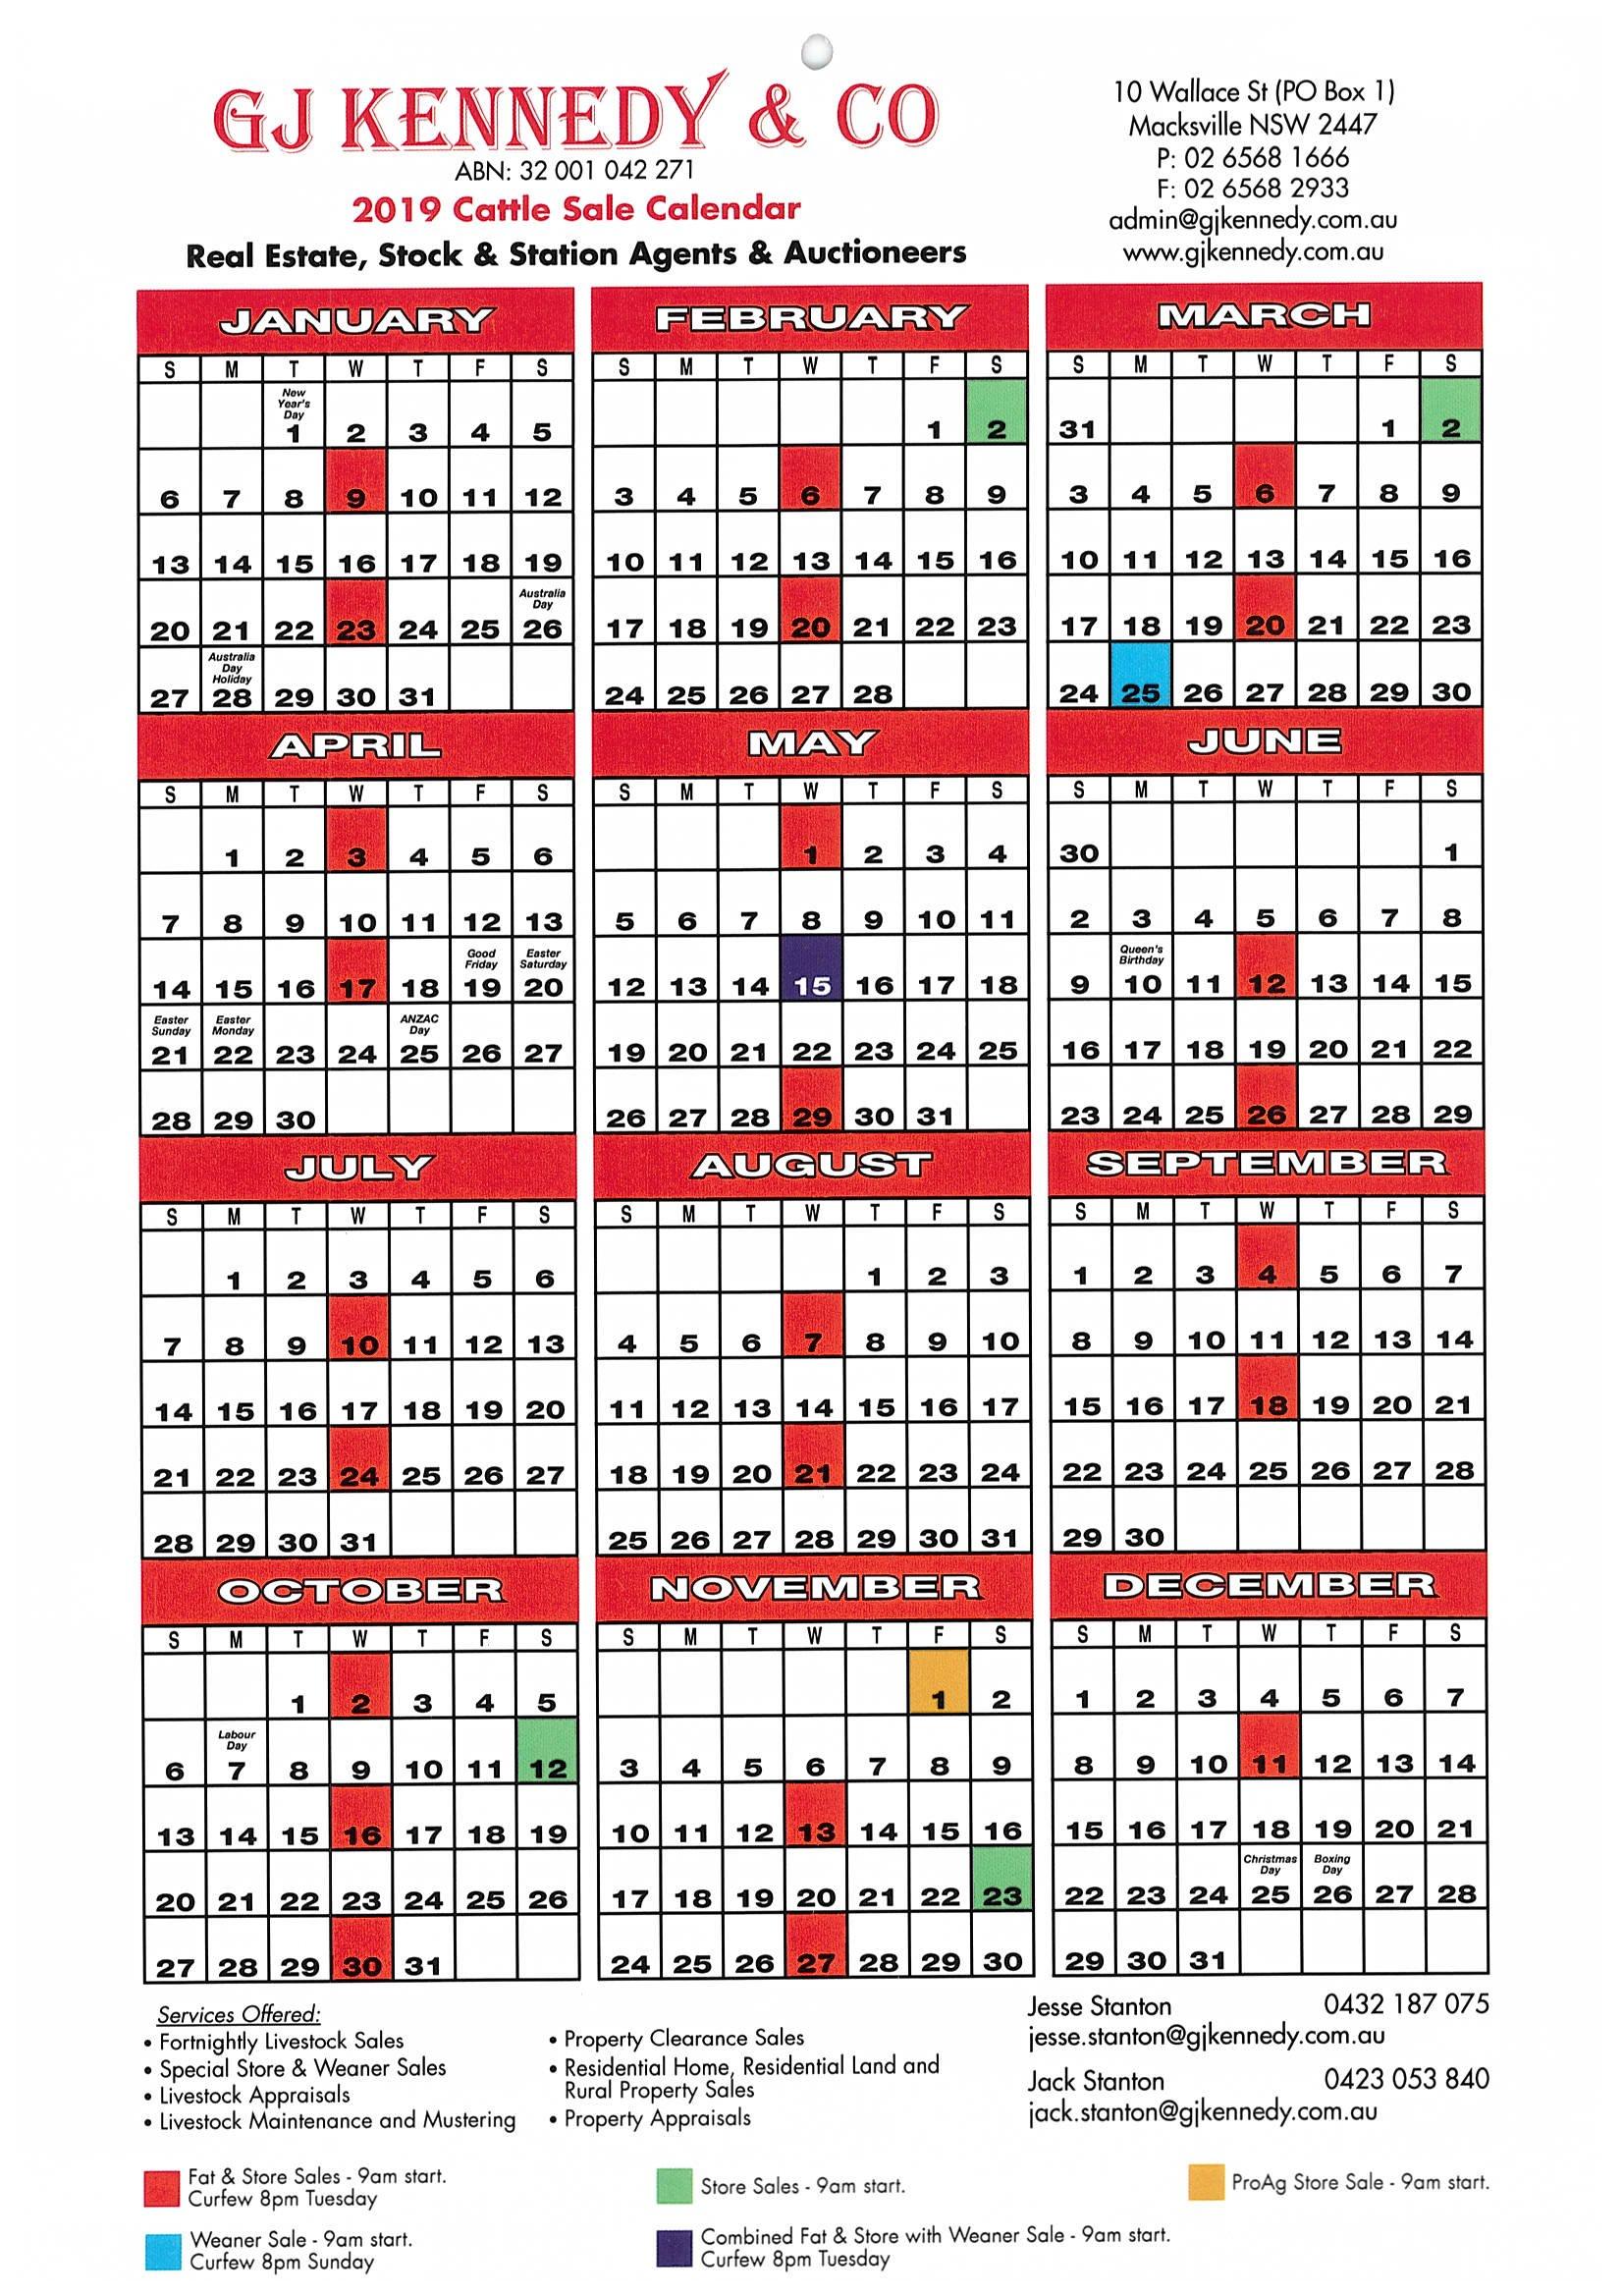 G J Kennedy & Co Pty Ltd – Livestock Sale Dates Calendar 2019 Sale